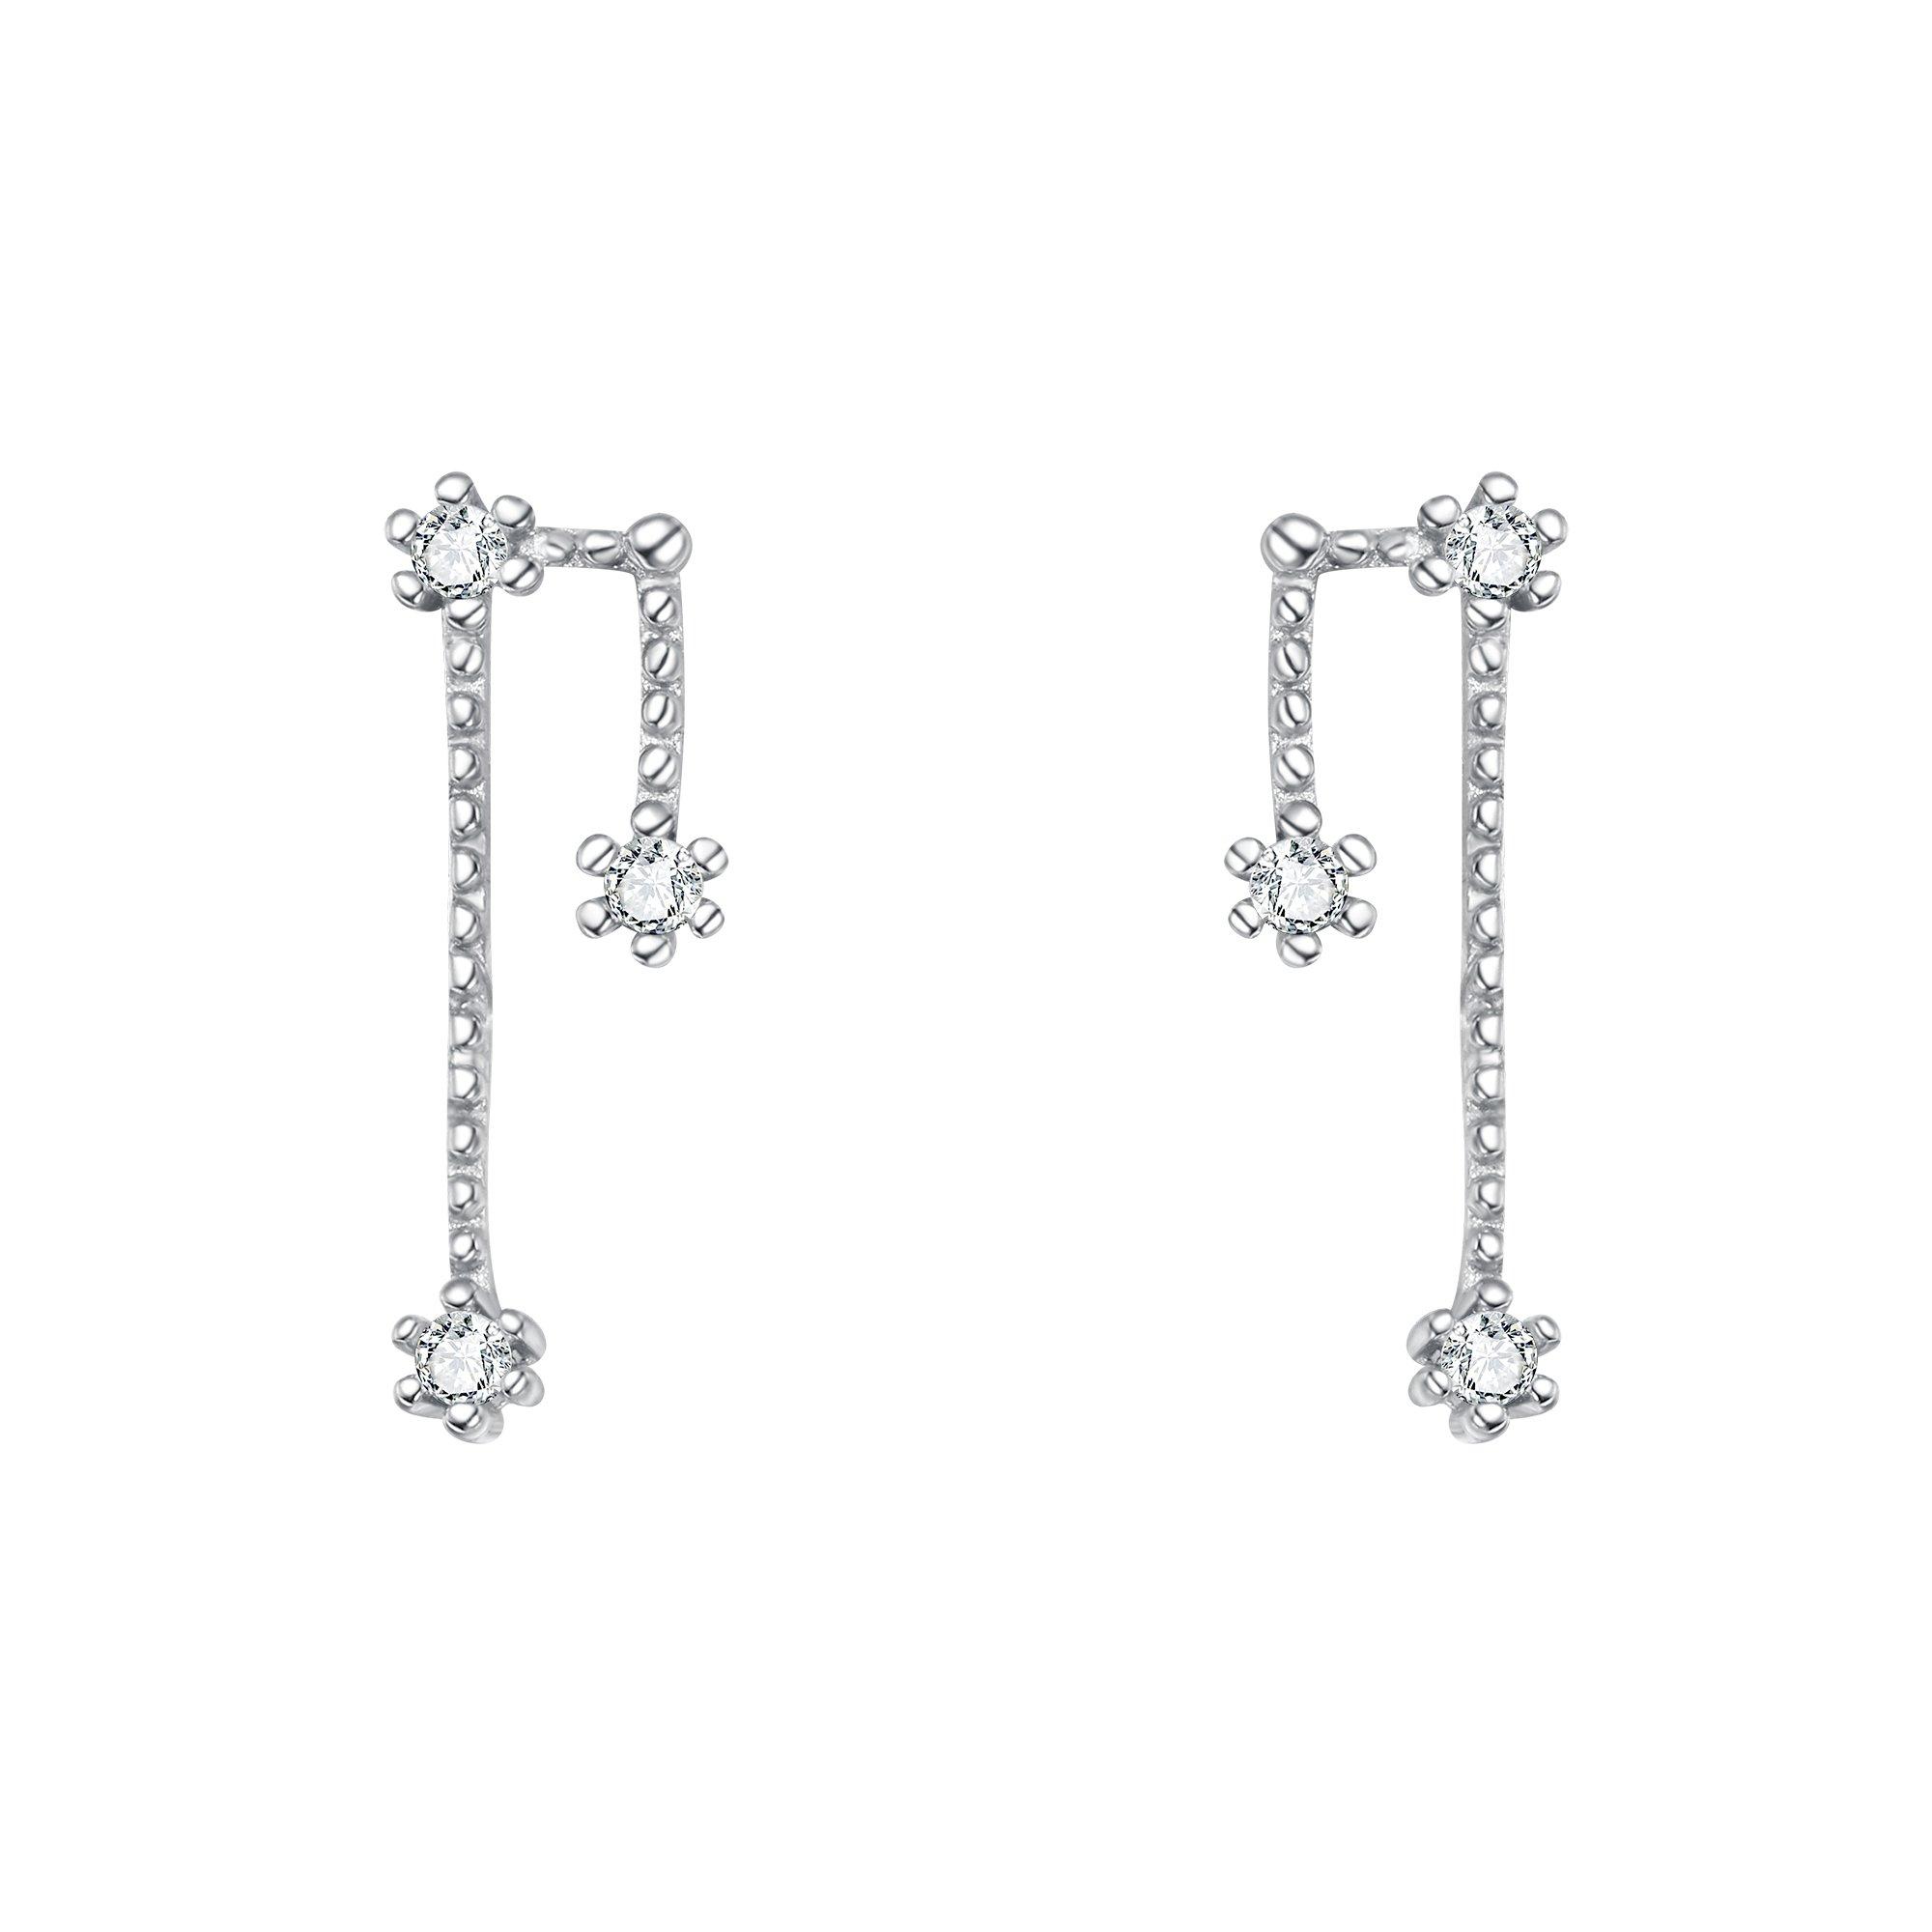 BriLove 925 Sterling Silver Ear Cuff - Taurus 12 Zodiac Constellation Horoscope Astrology CZ Ear Vine Post Crawler Earrings for Women